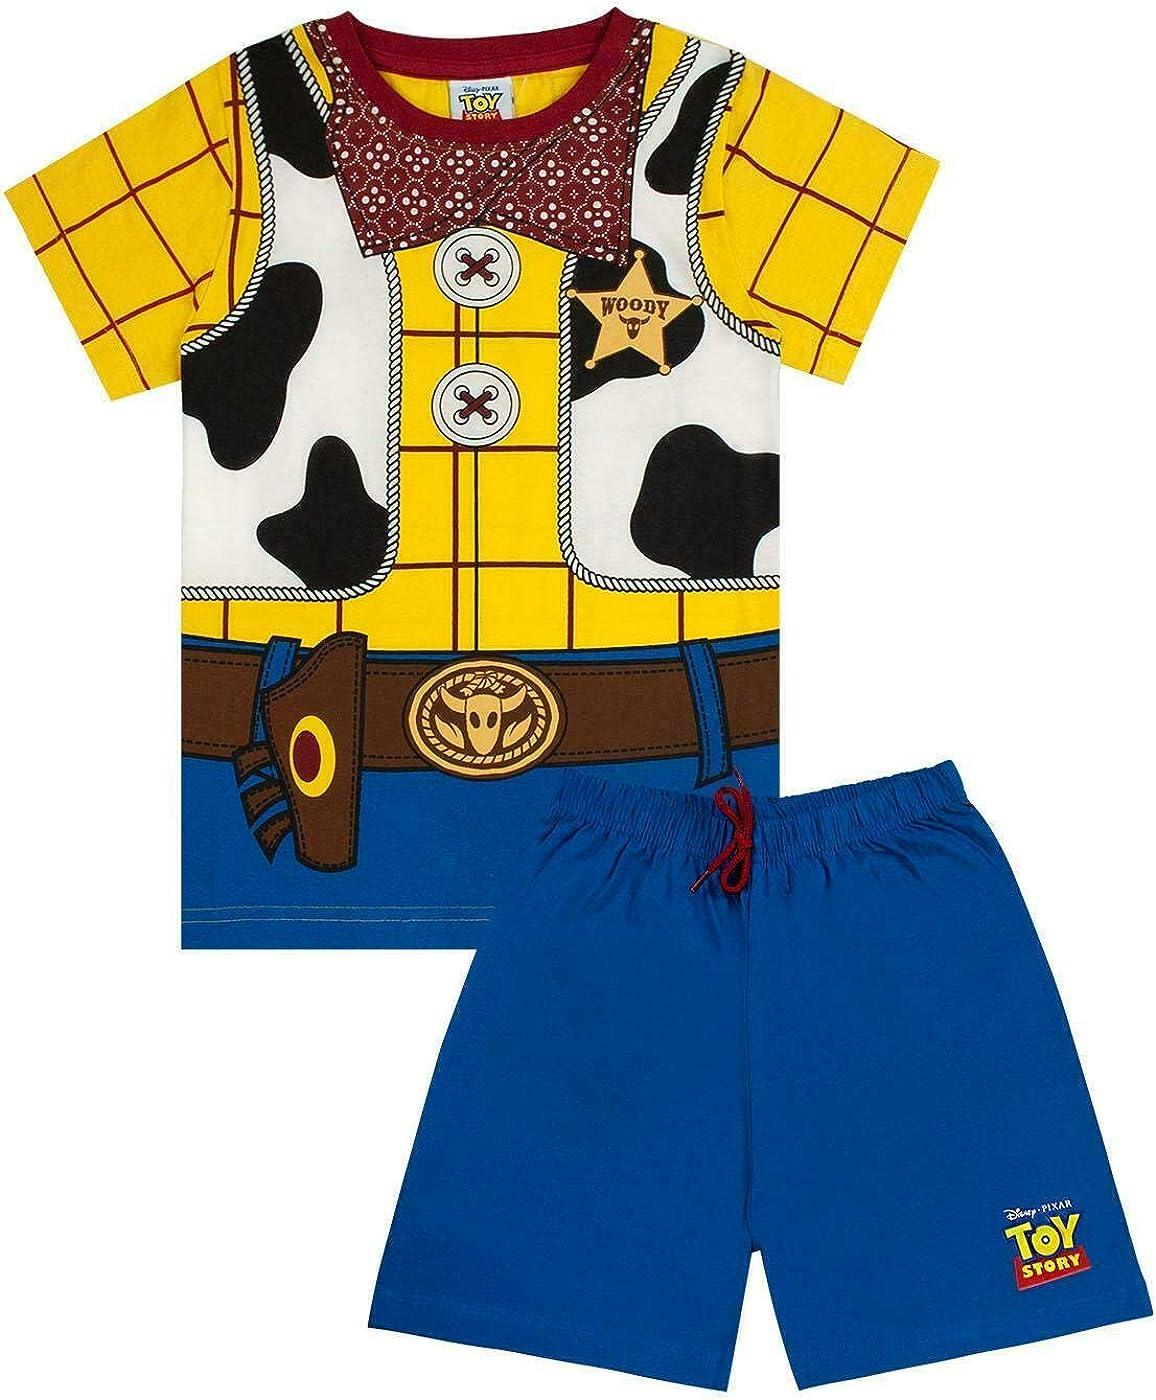 Toy Story Niños Corto Pijama de Disney Pixar Woody Traje de Niño ...